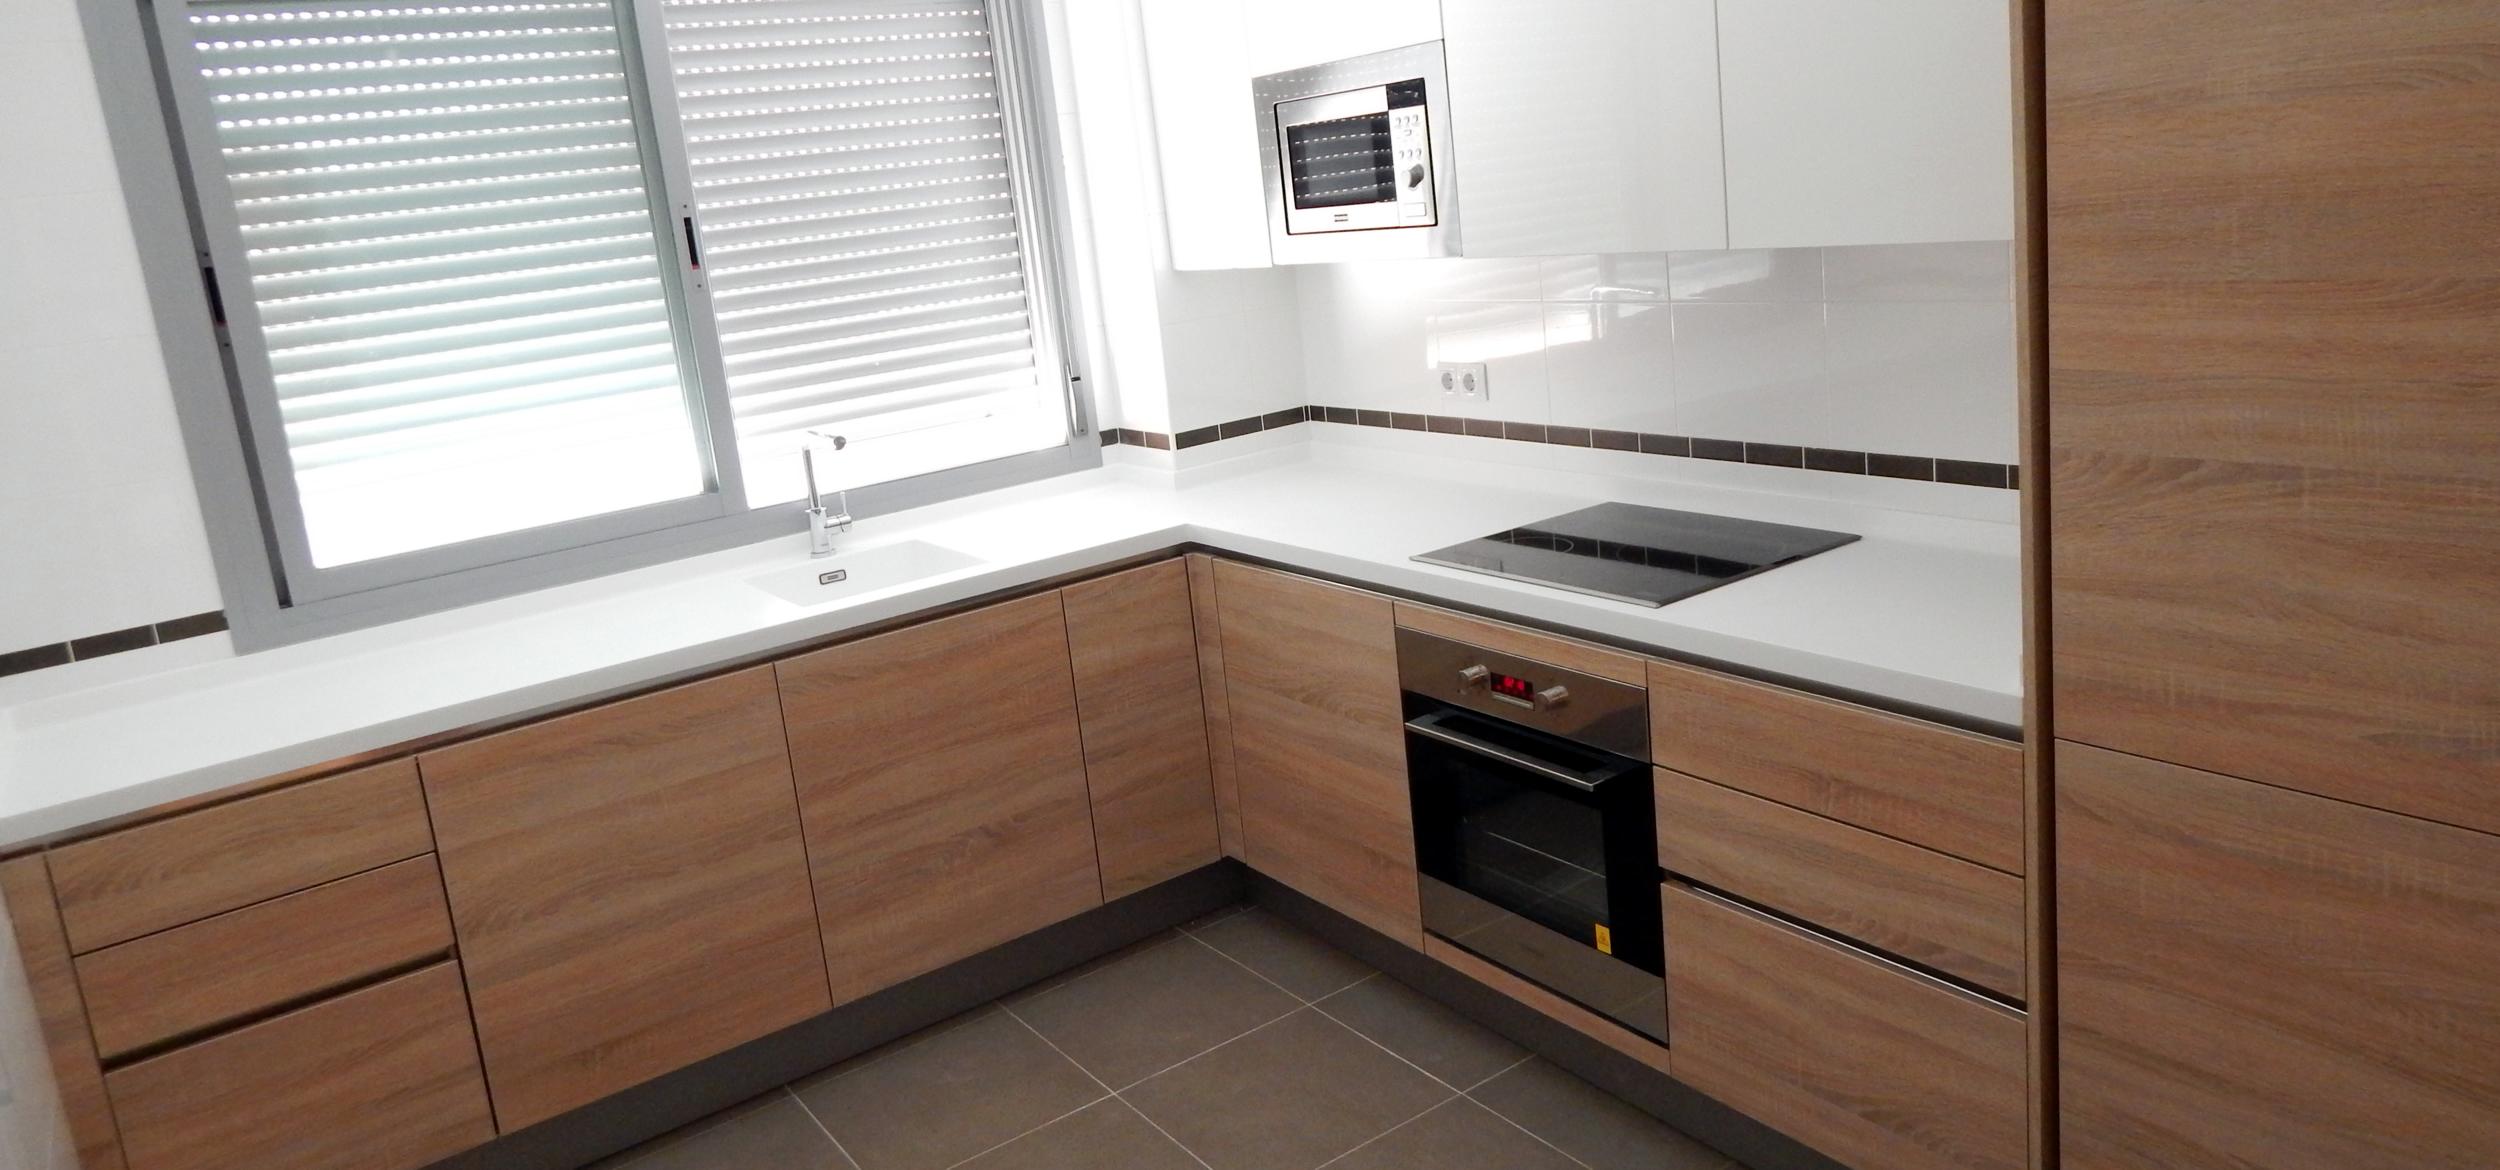 Muebles de cocina sin tiradores for Diseno de muebles para cocina